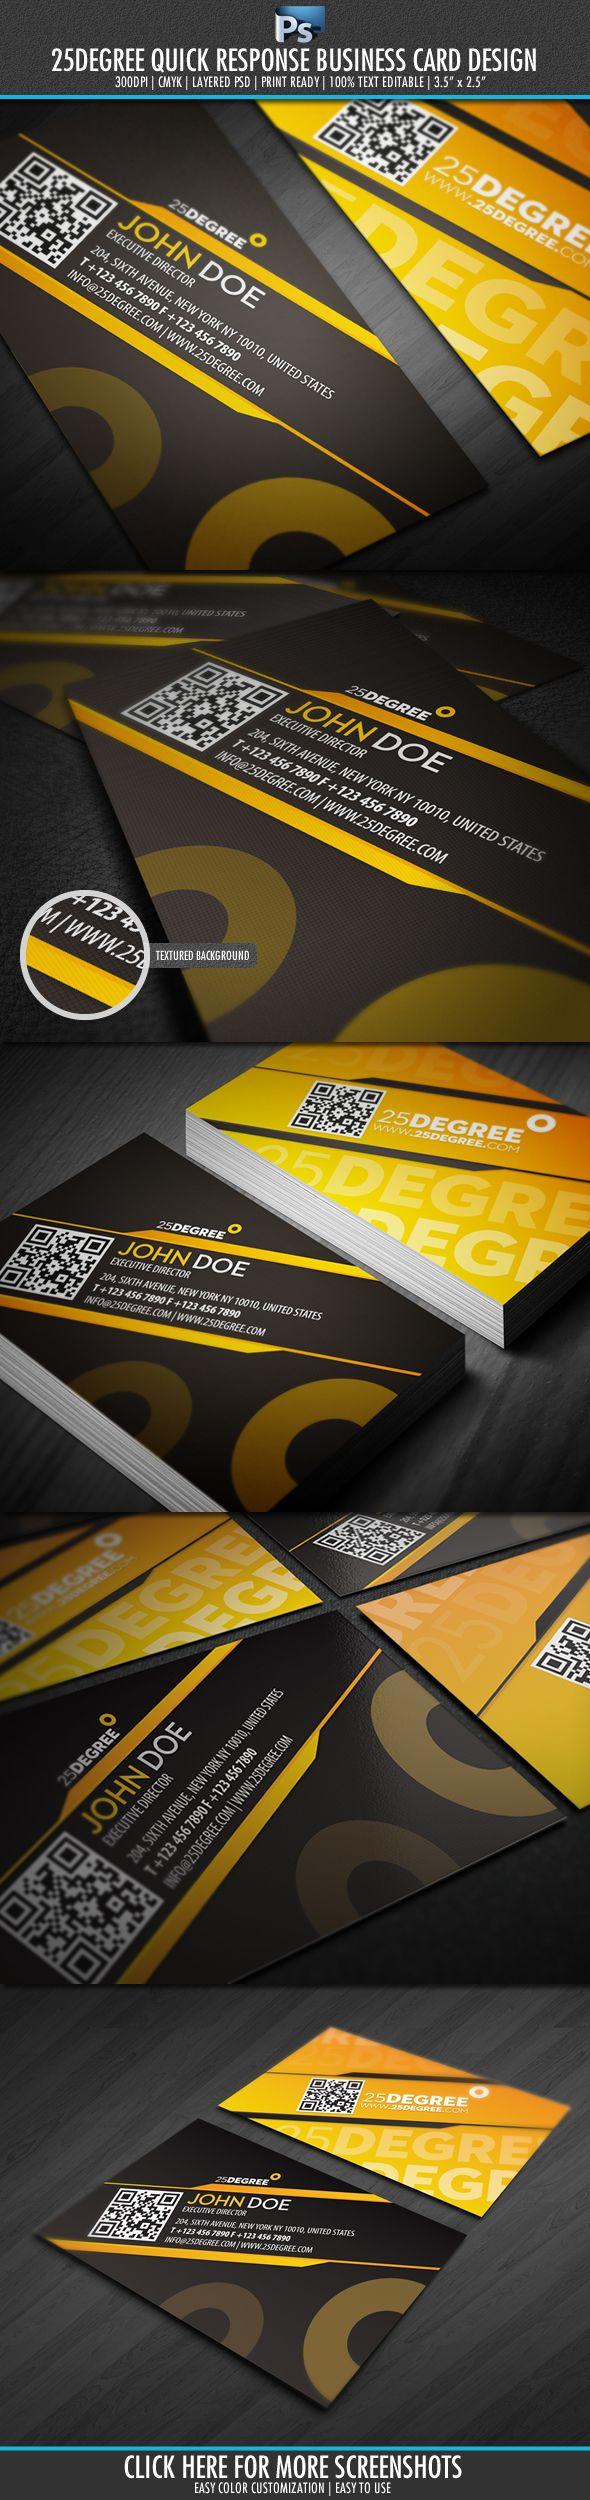 25 degree Quick Response Business Card by ~Lemongraphic on deviantART  http://www.techirsh.com